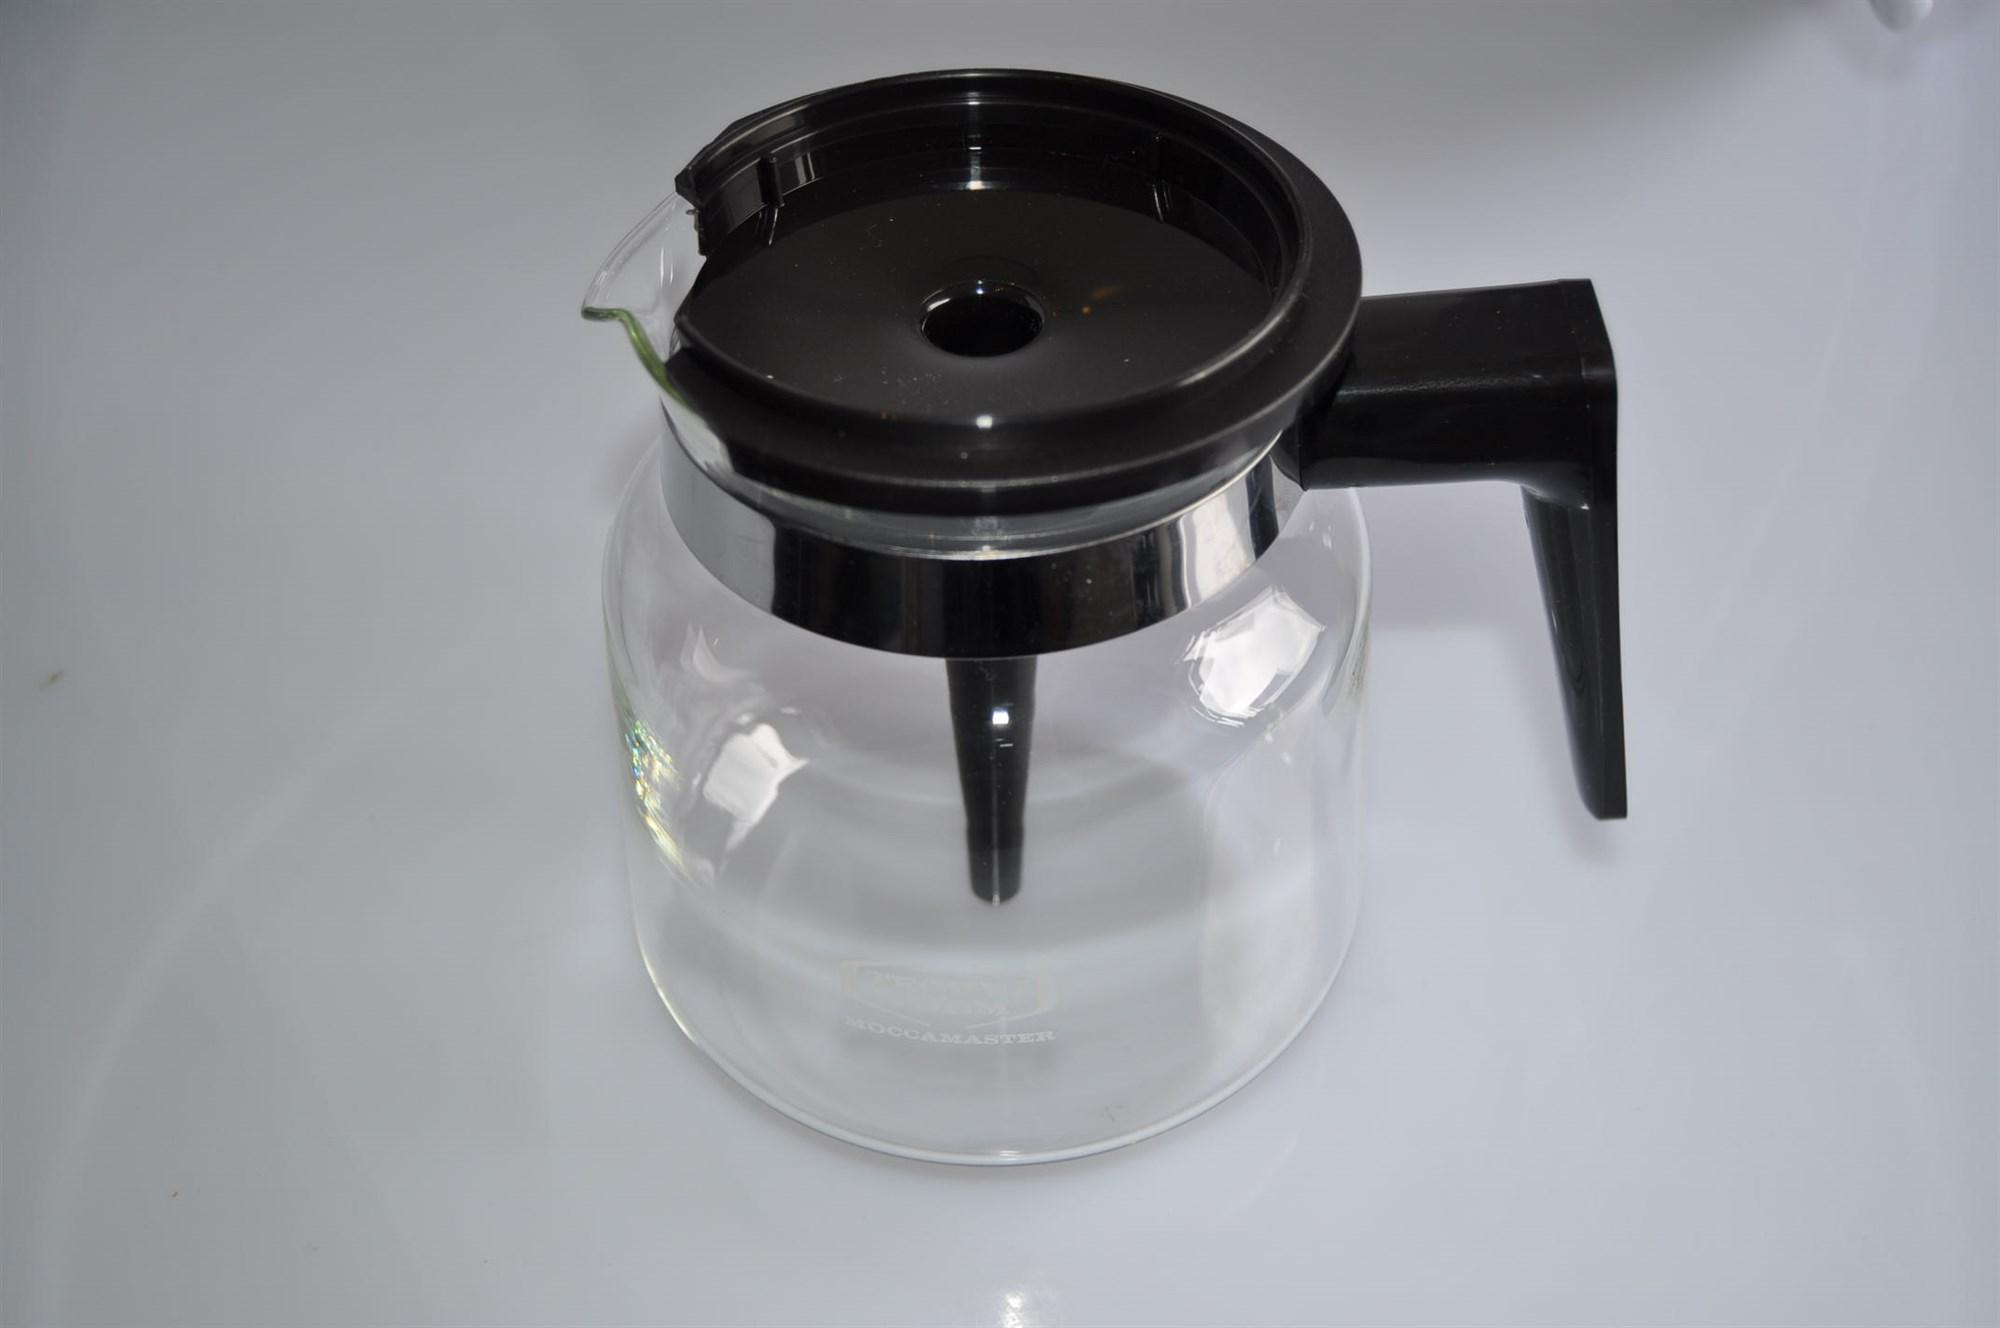 Glass Jug For Coffee Maker : Glass jug, Moccamaster coffee maker - 1250 ml